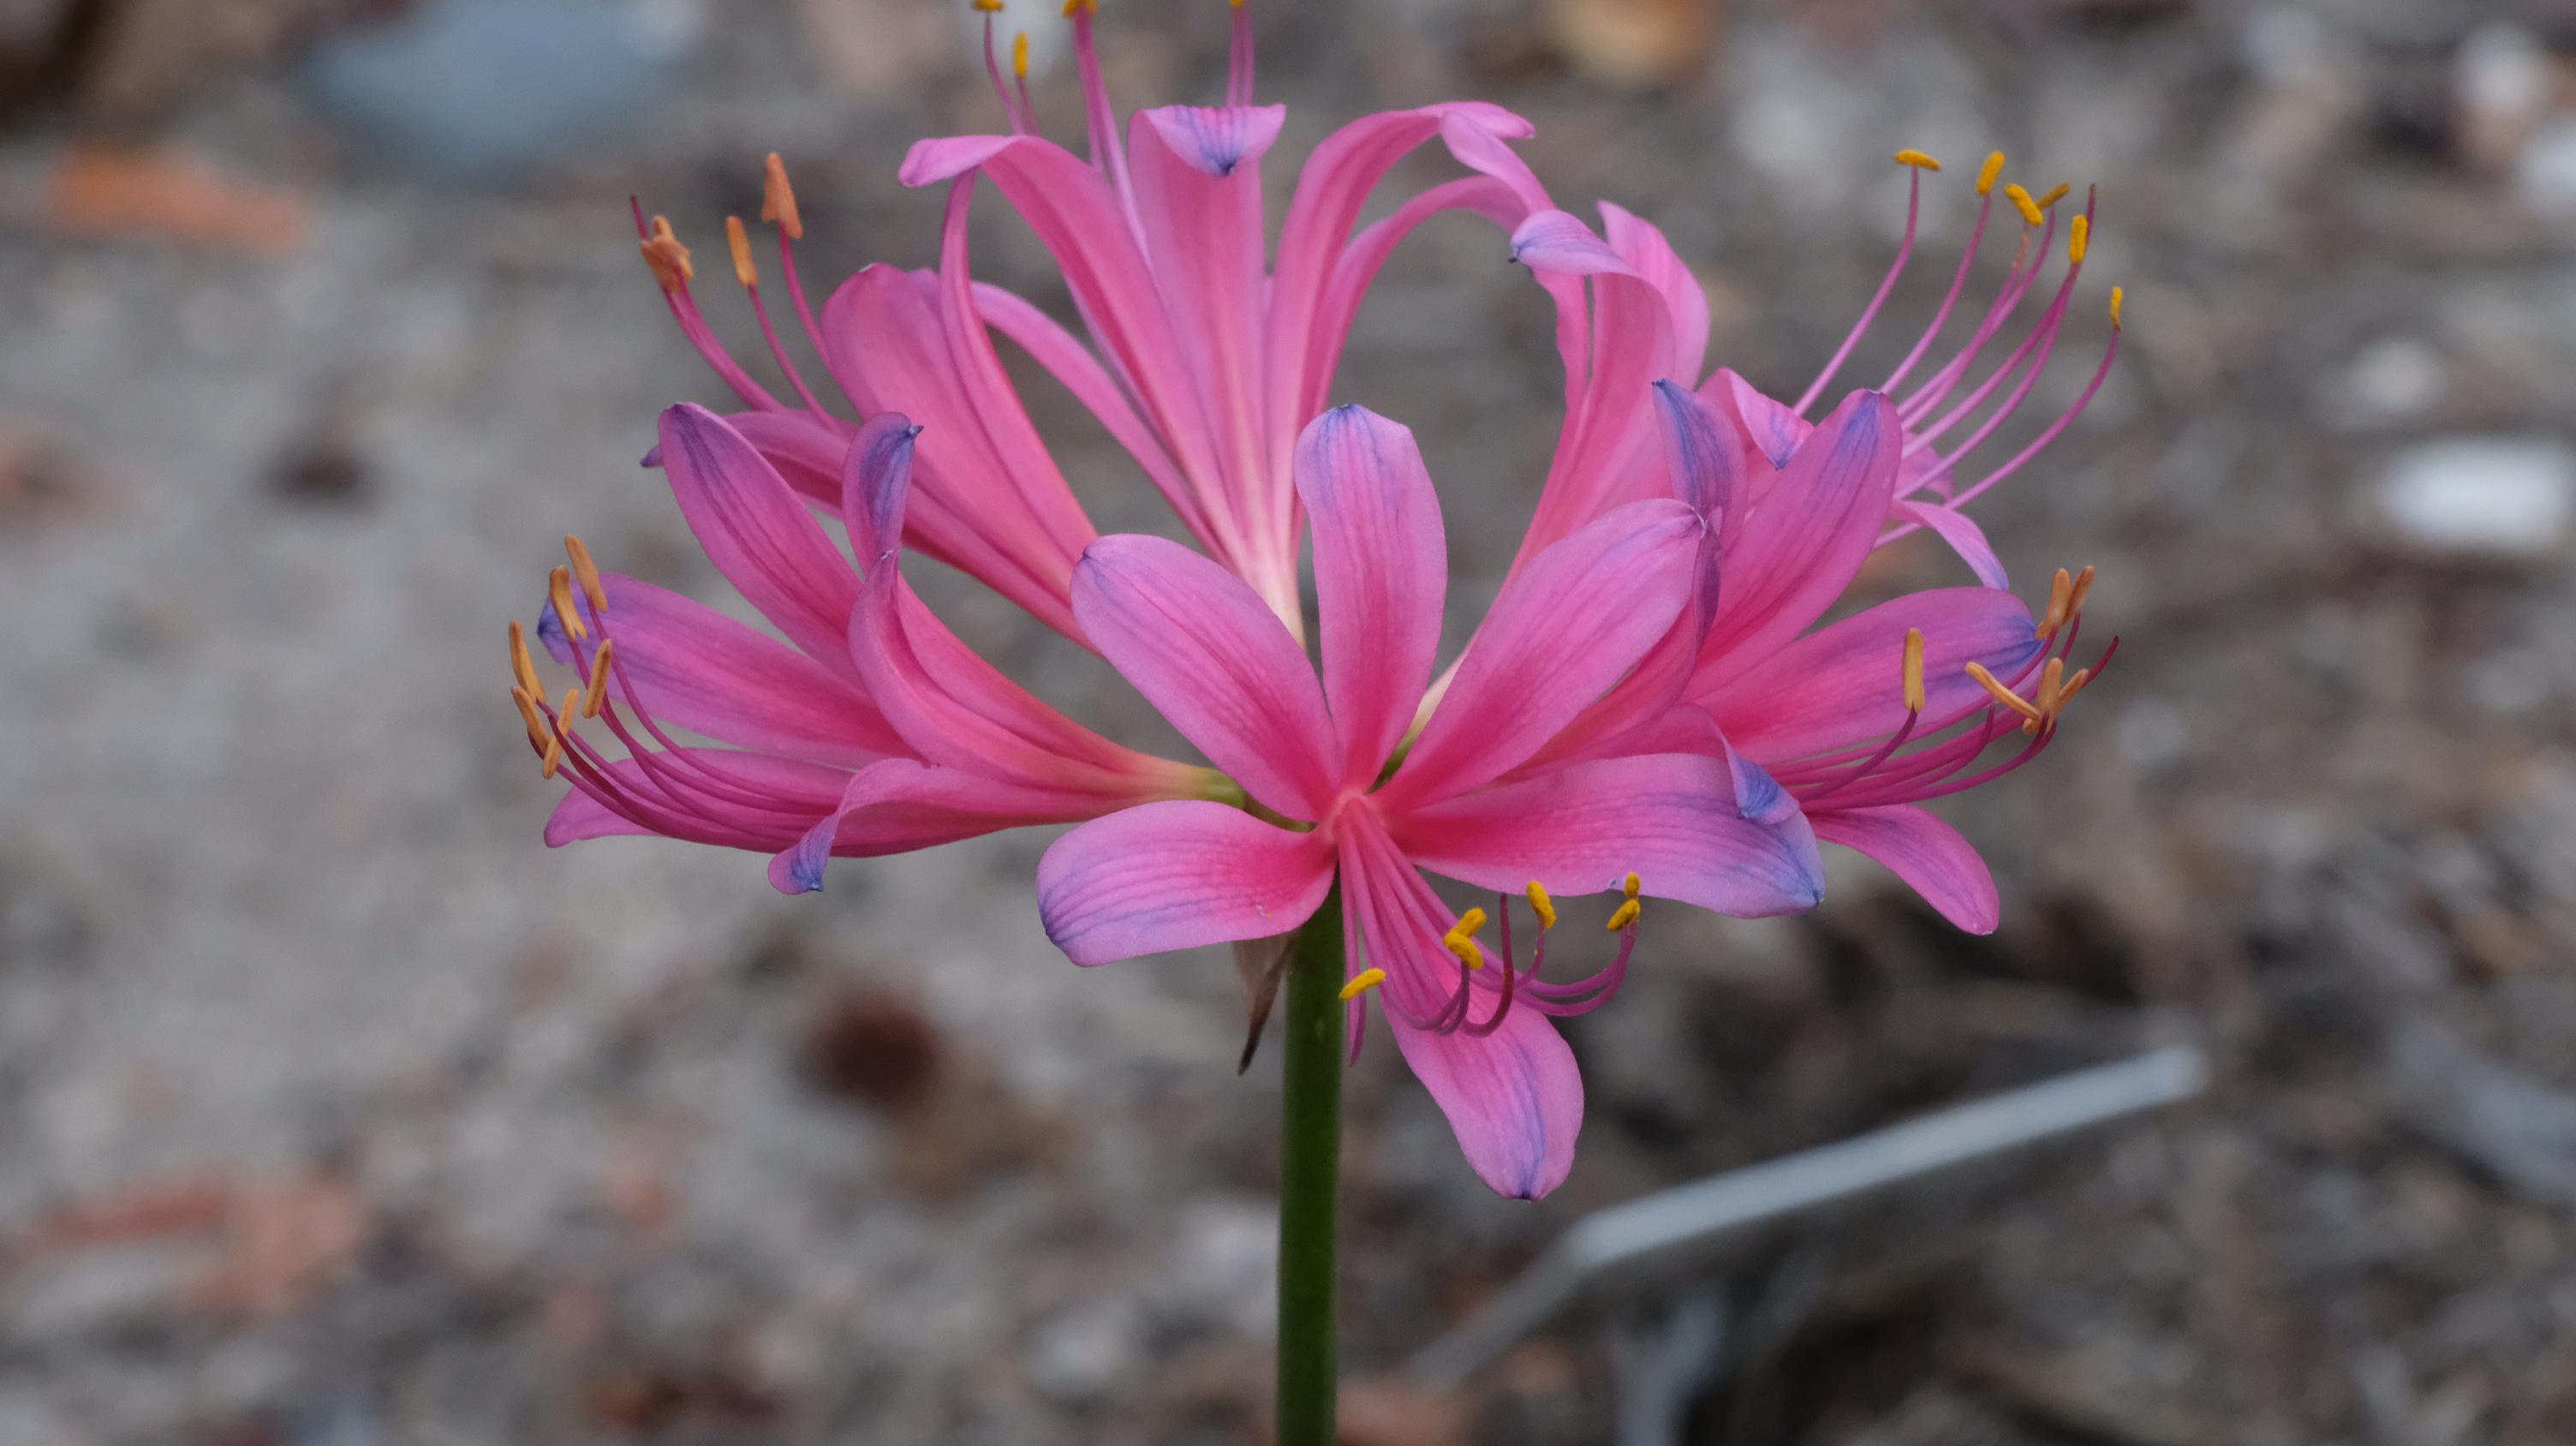 Lycoris x rosea 'Hazuki Elegance' @ JLBG - a Komoriya hybrid